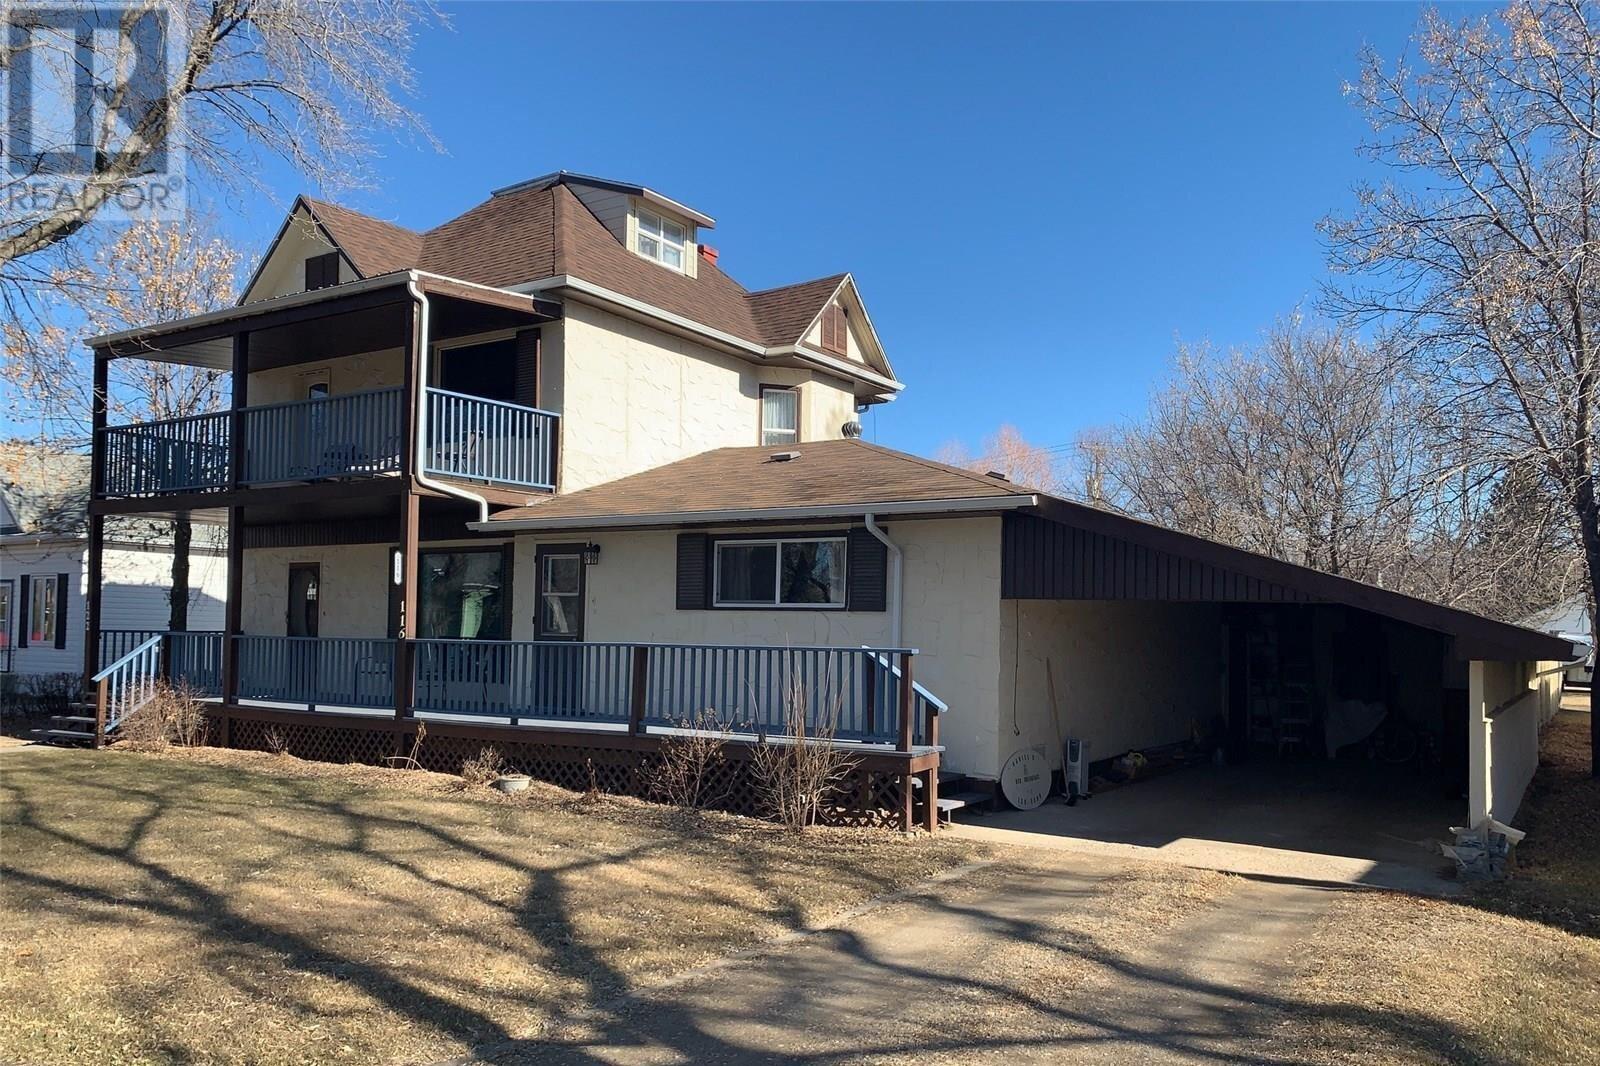 House for sale at 122 8th Ave W Unit 116 Melville Saskatchewan - MLS: SK834639